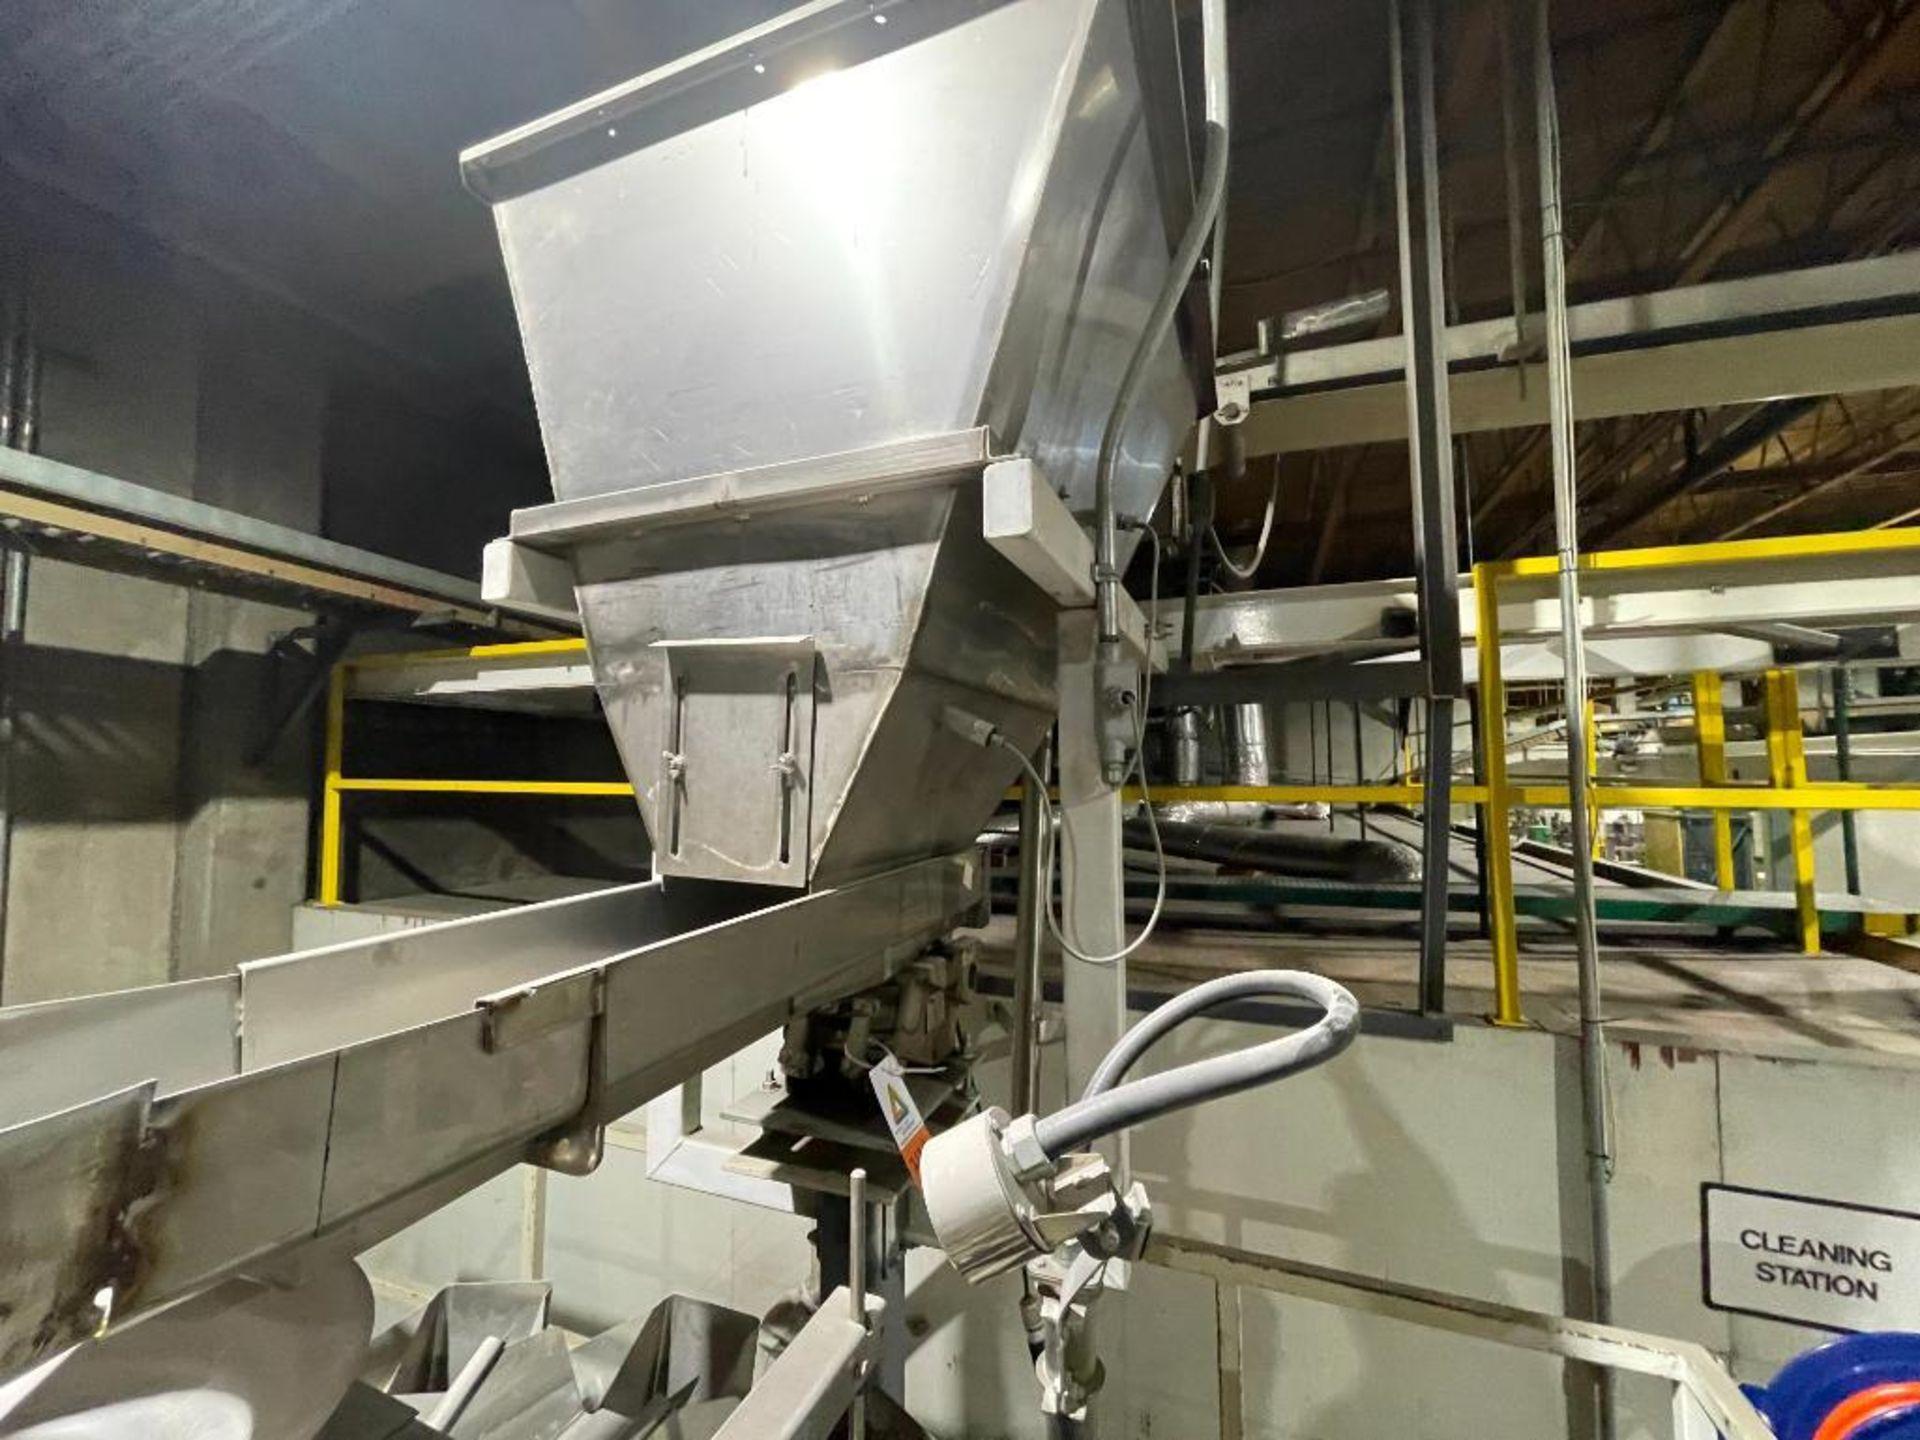 Eriez vibratory conveyor - Image 8 of 12